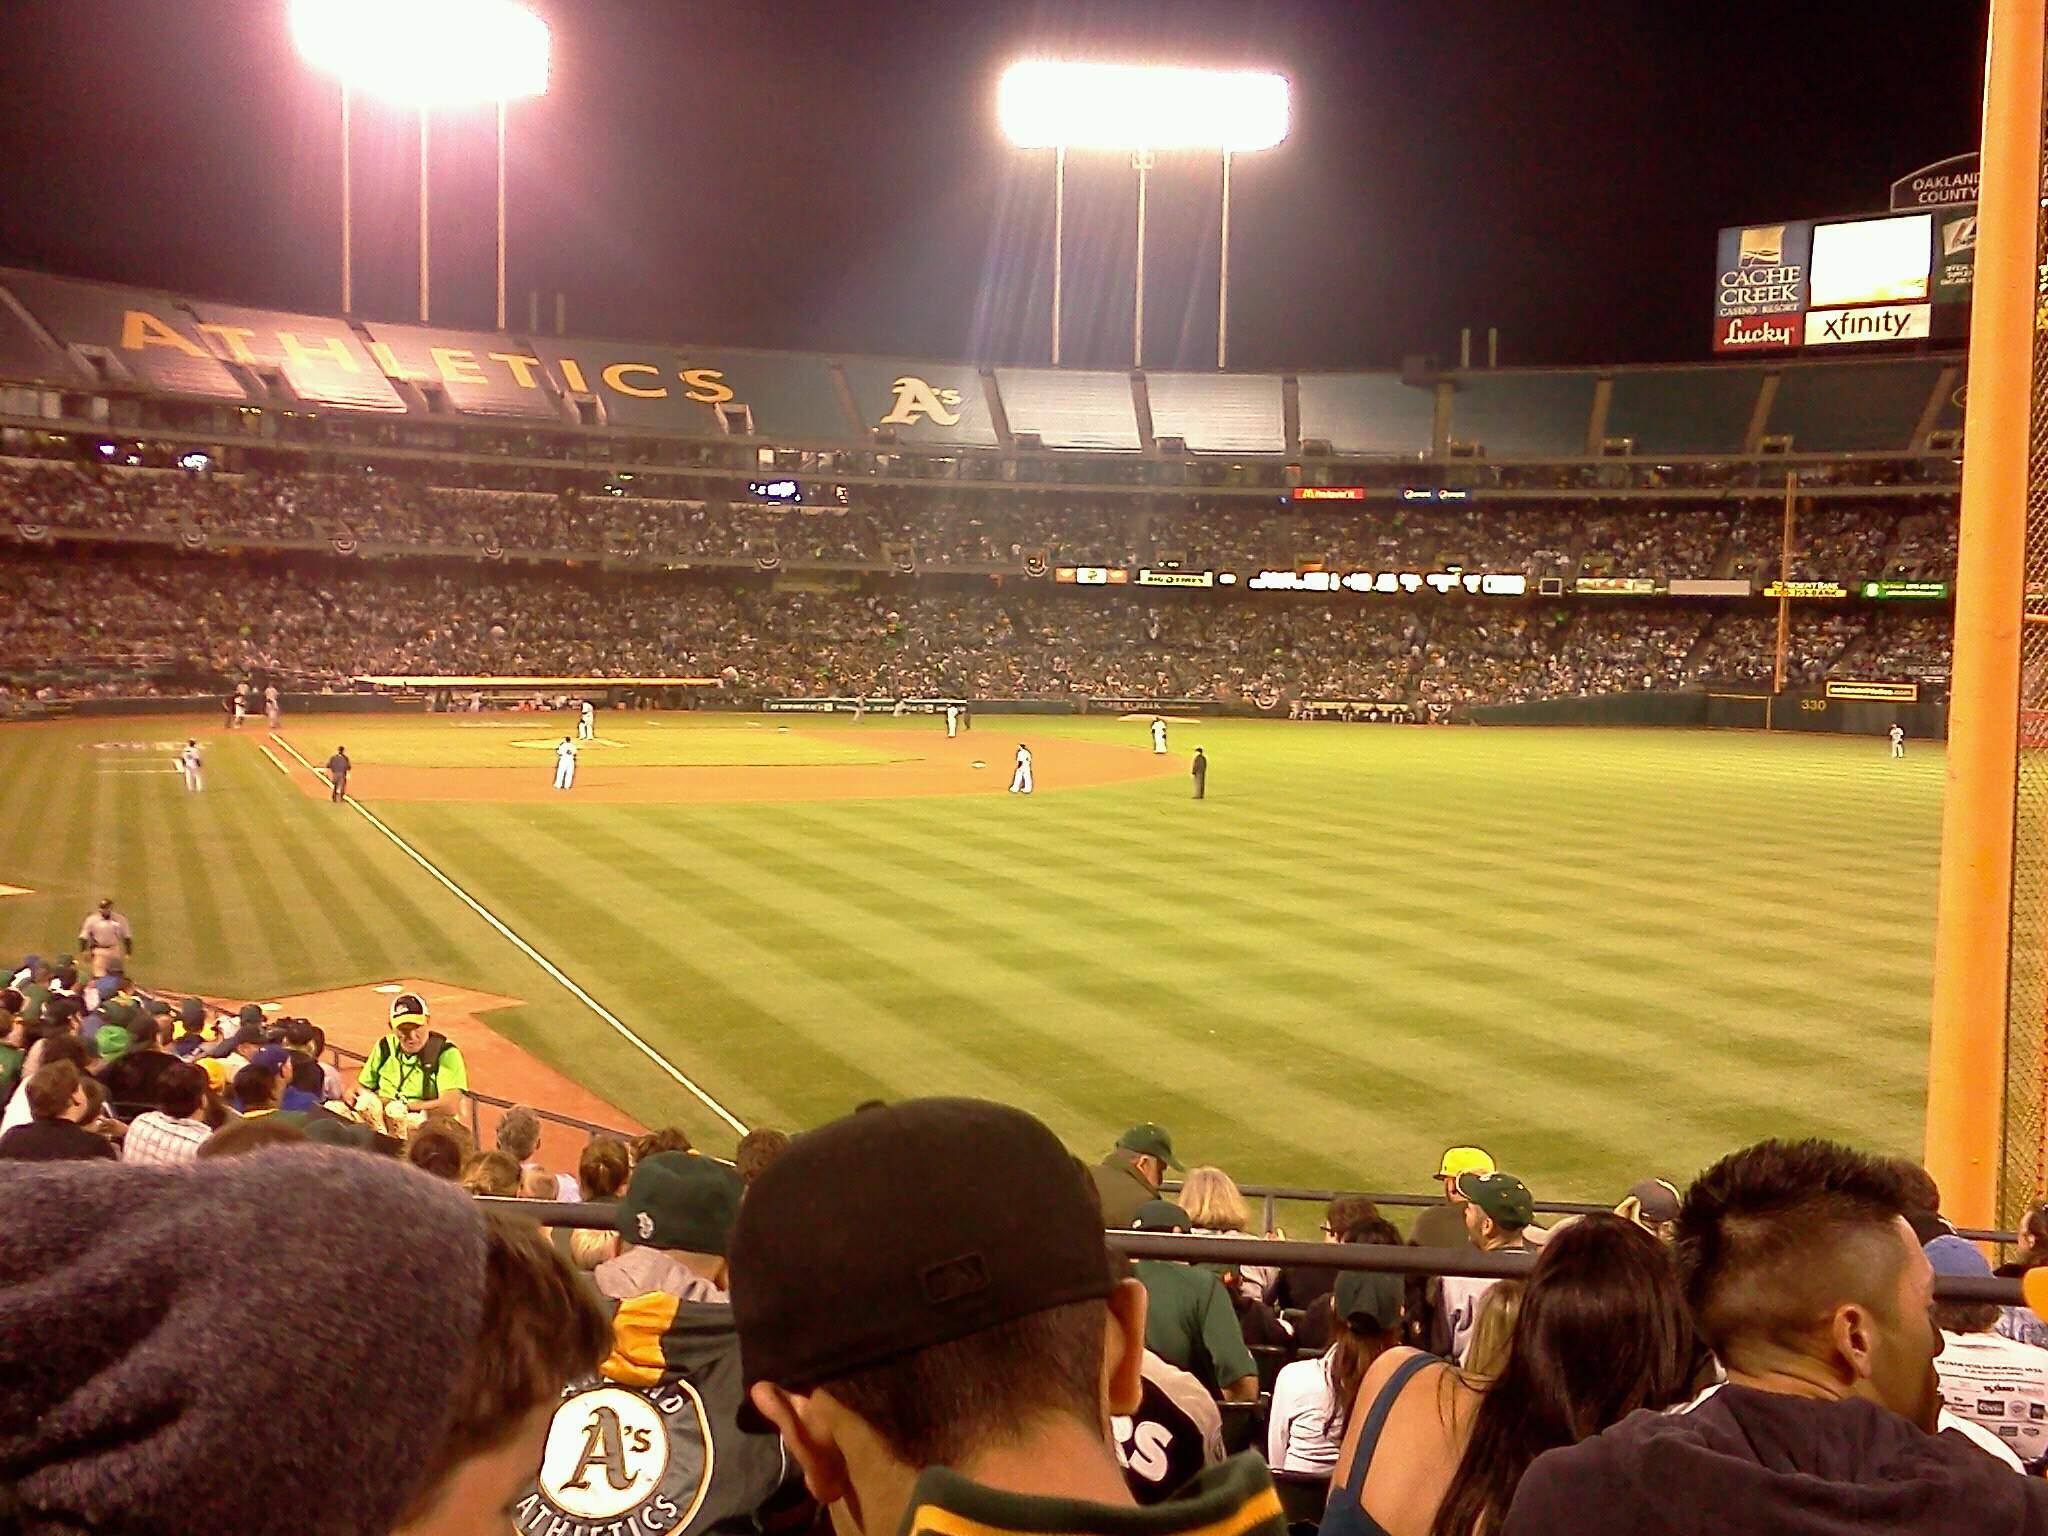 Oakland Alameda Coliseum Section 103 Row 24 Seat 10